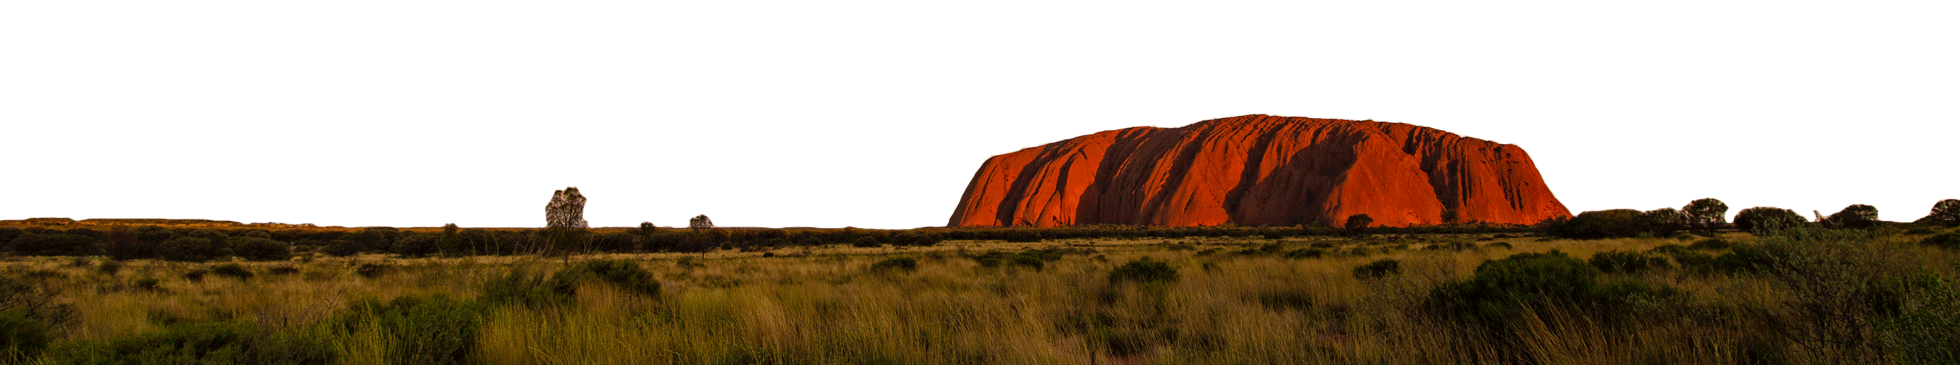 Visuel horizontal voyage Australie